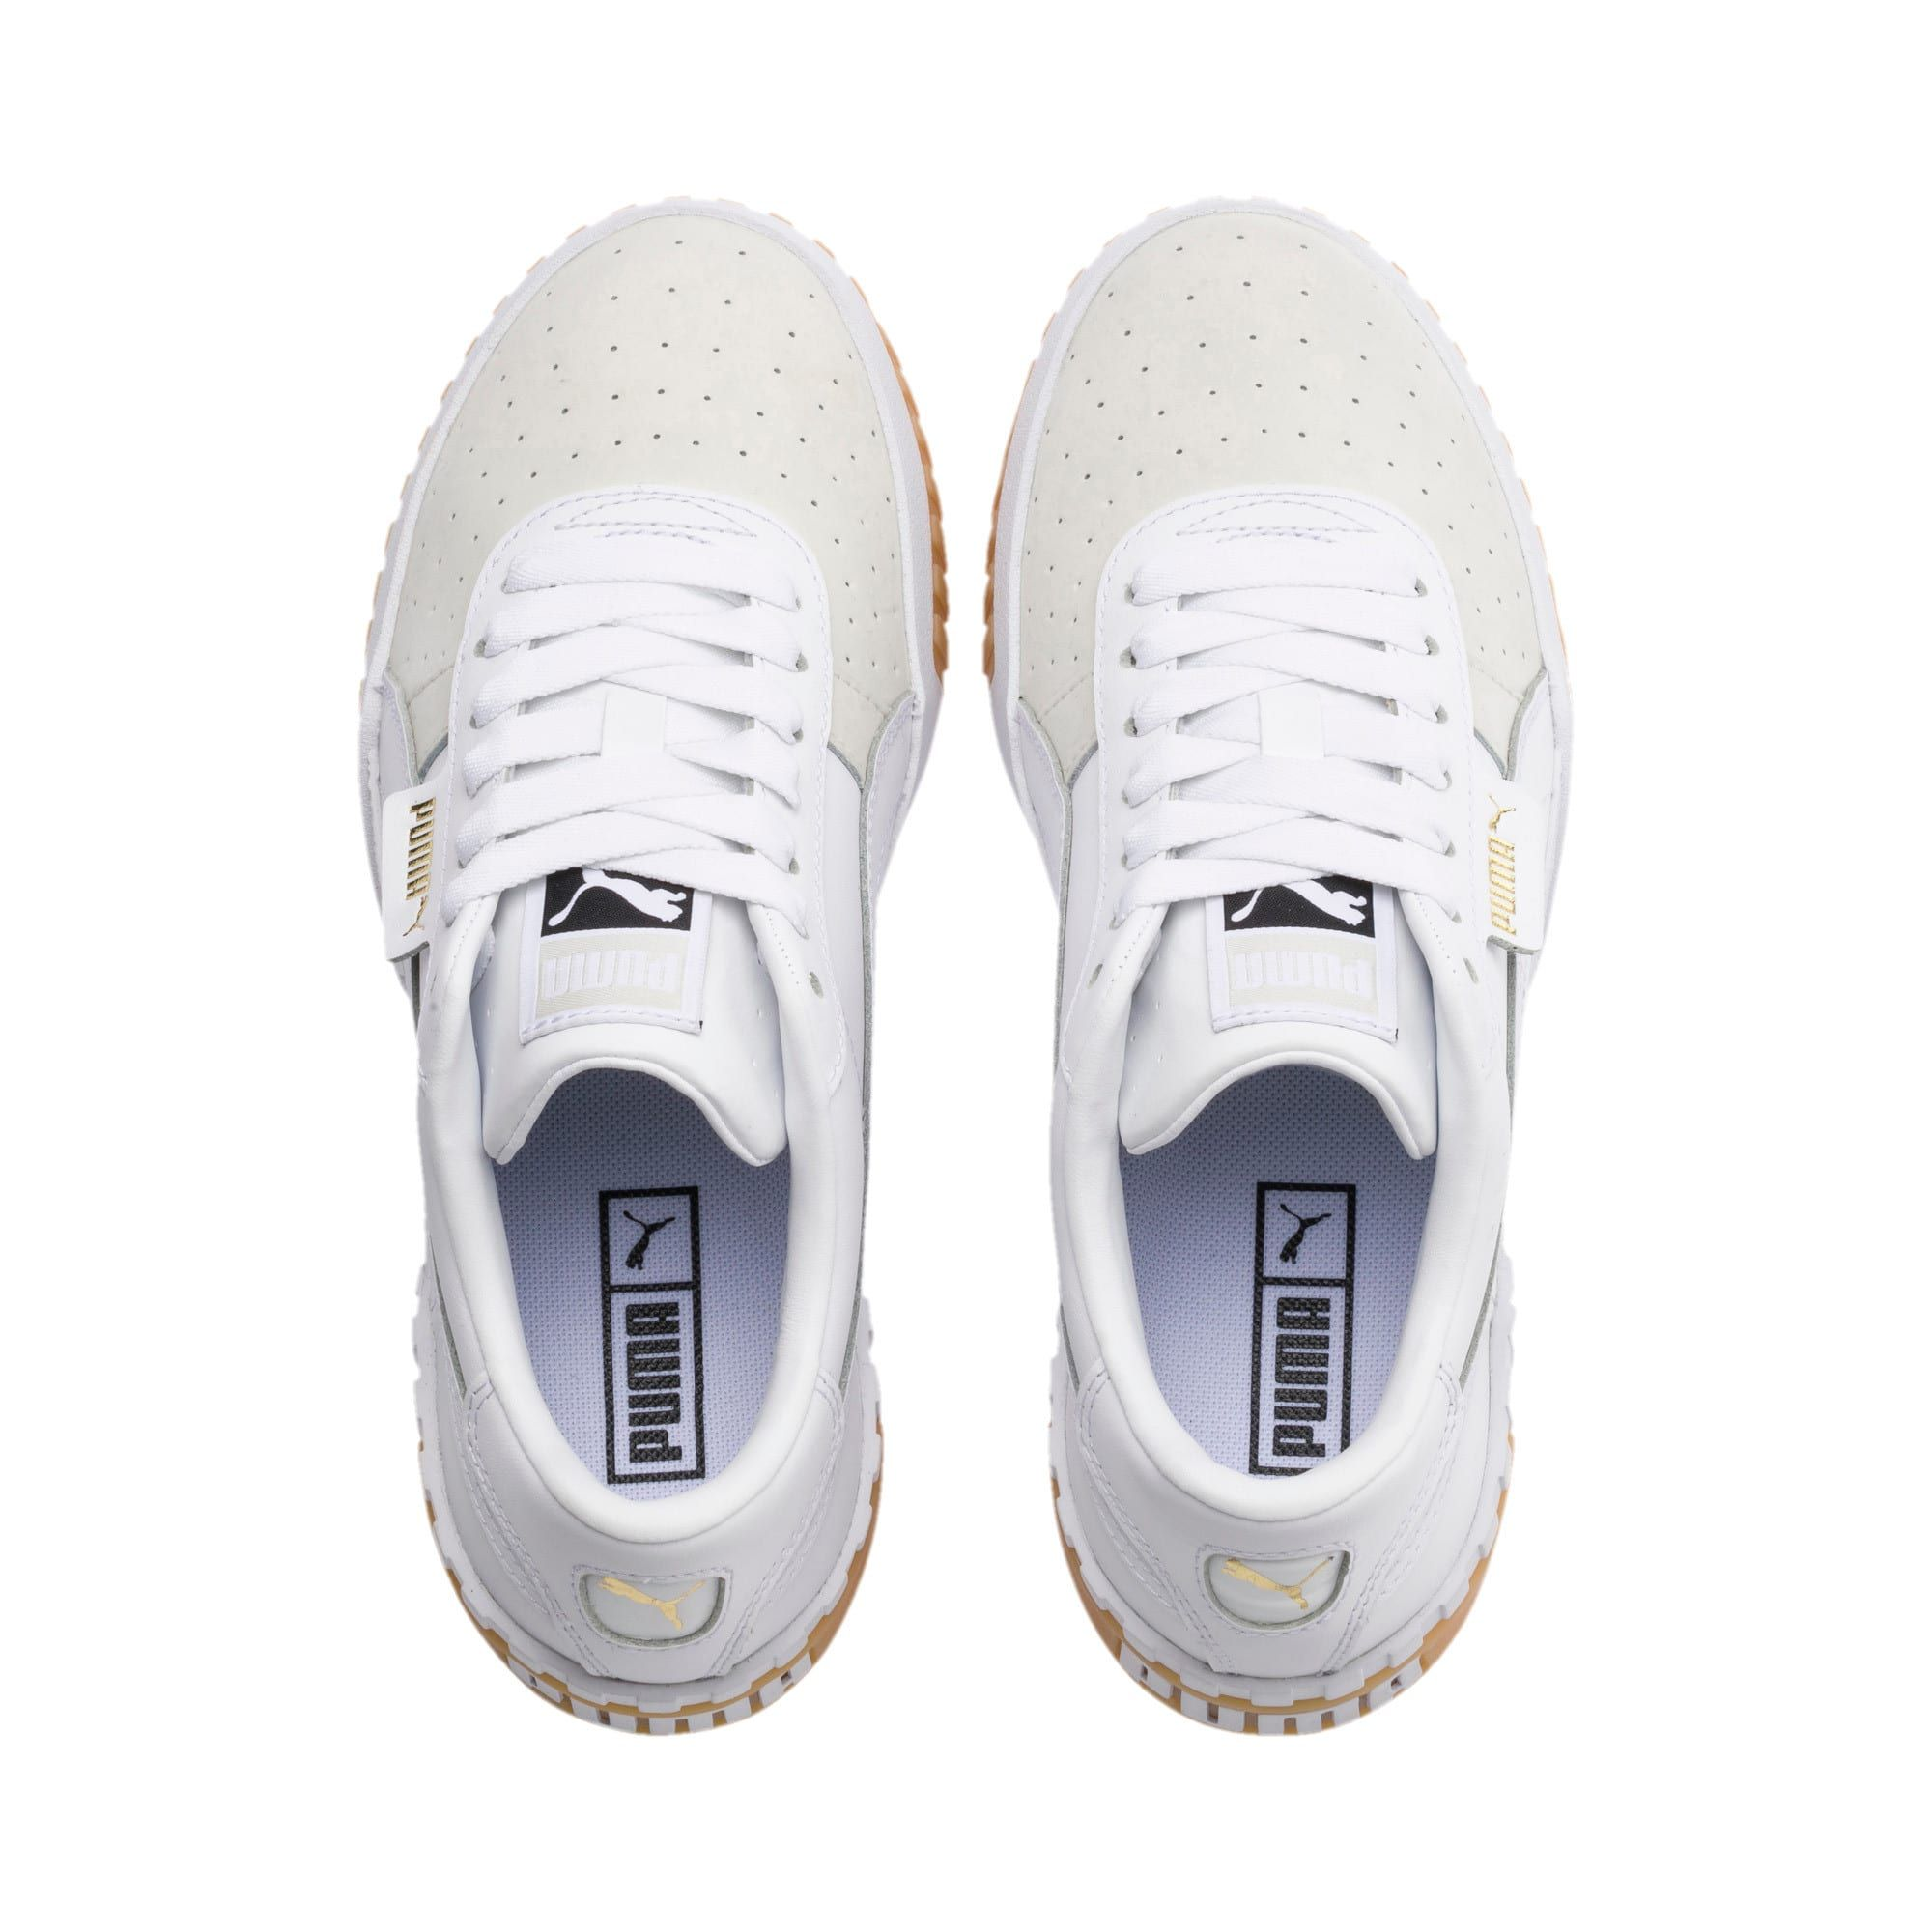 Cali Women's Trainers in 2020 | Puma shoes women, White puma